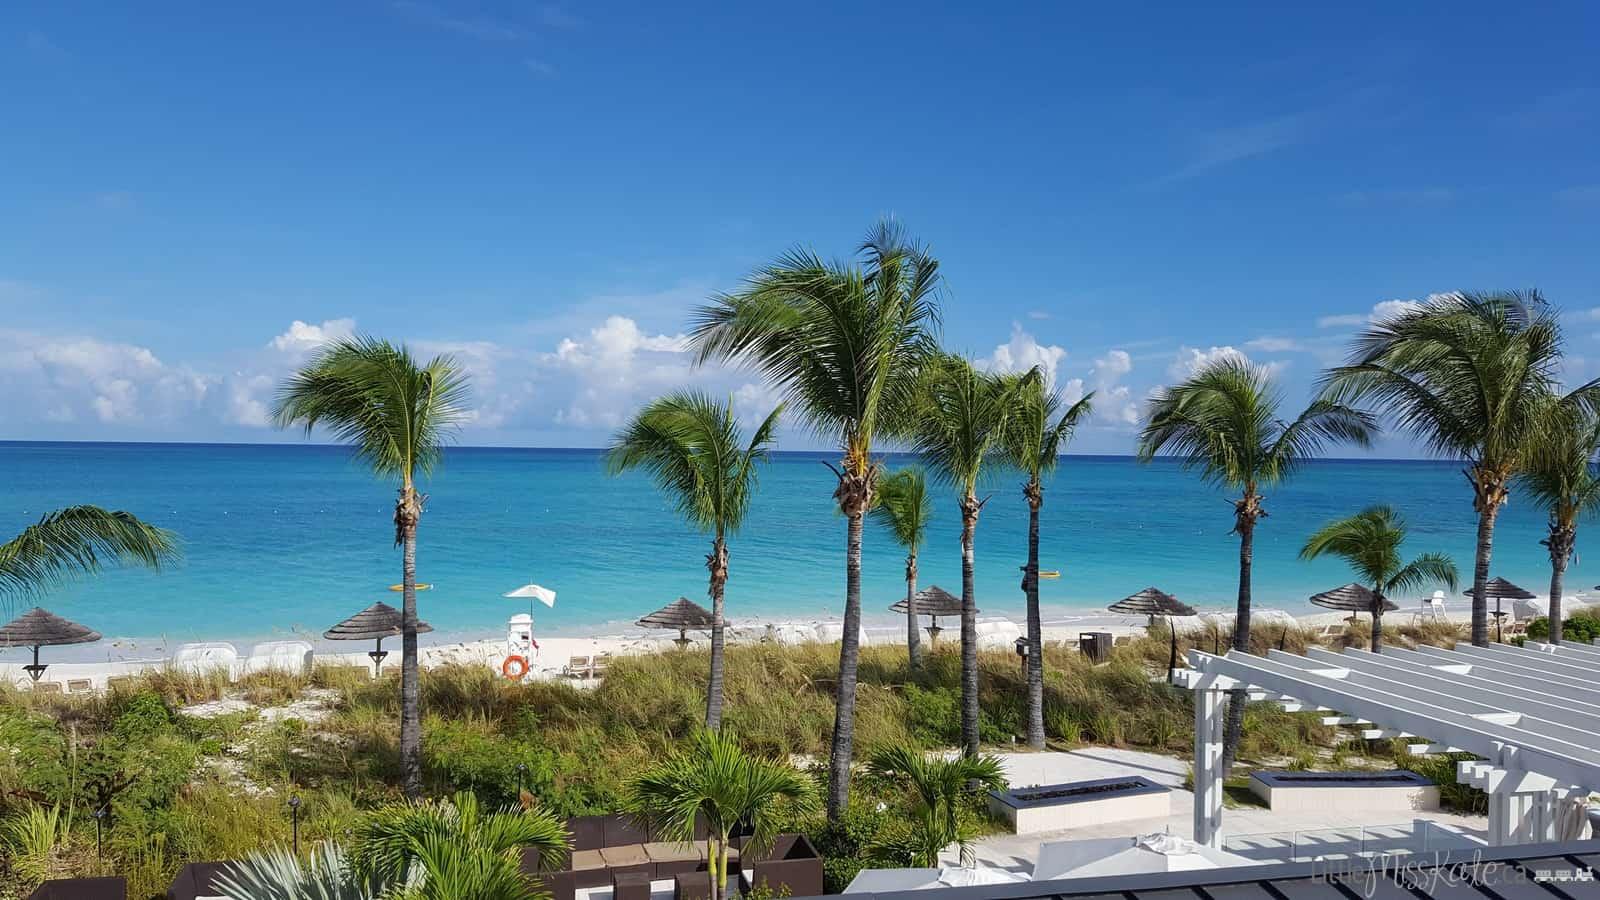 Beaches Resort Villages Key West Village Turks and Caicos via www.littlemisskate.ca